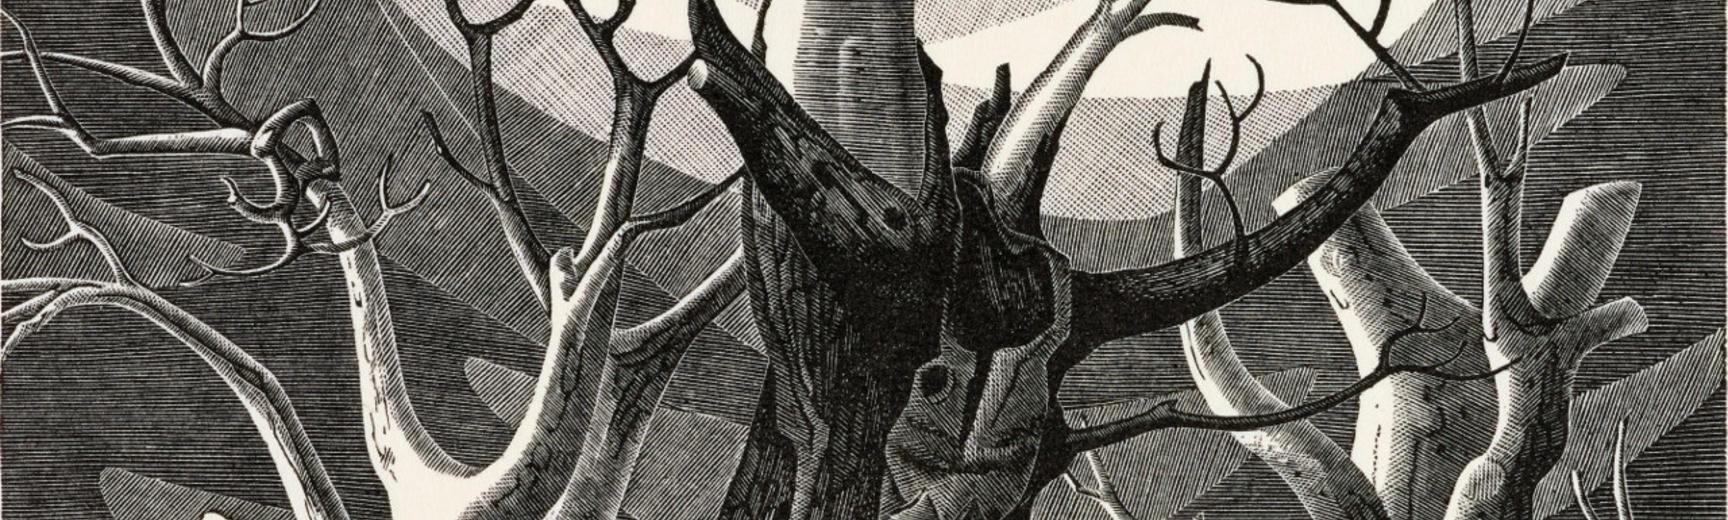 Monica Poole, Dead Trees Sheppey